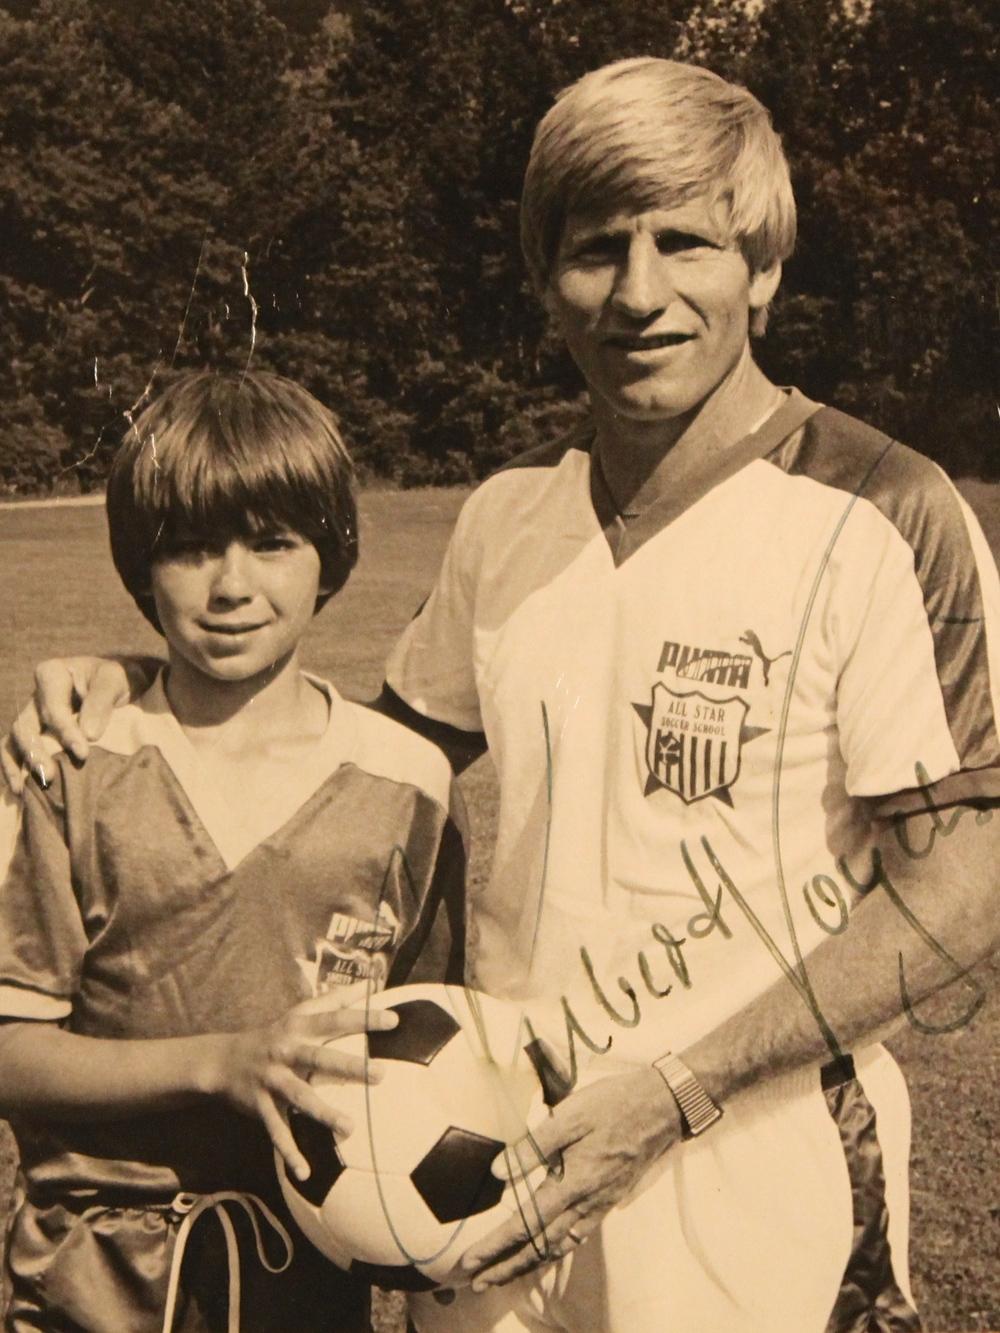 Hubert Vogelsinger(with Michael age 12) 1938 - present Professional soccer coach